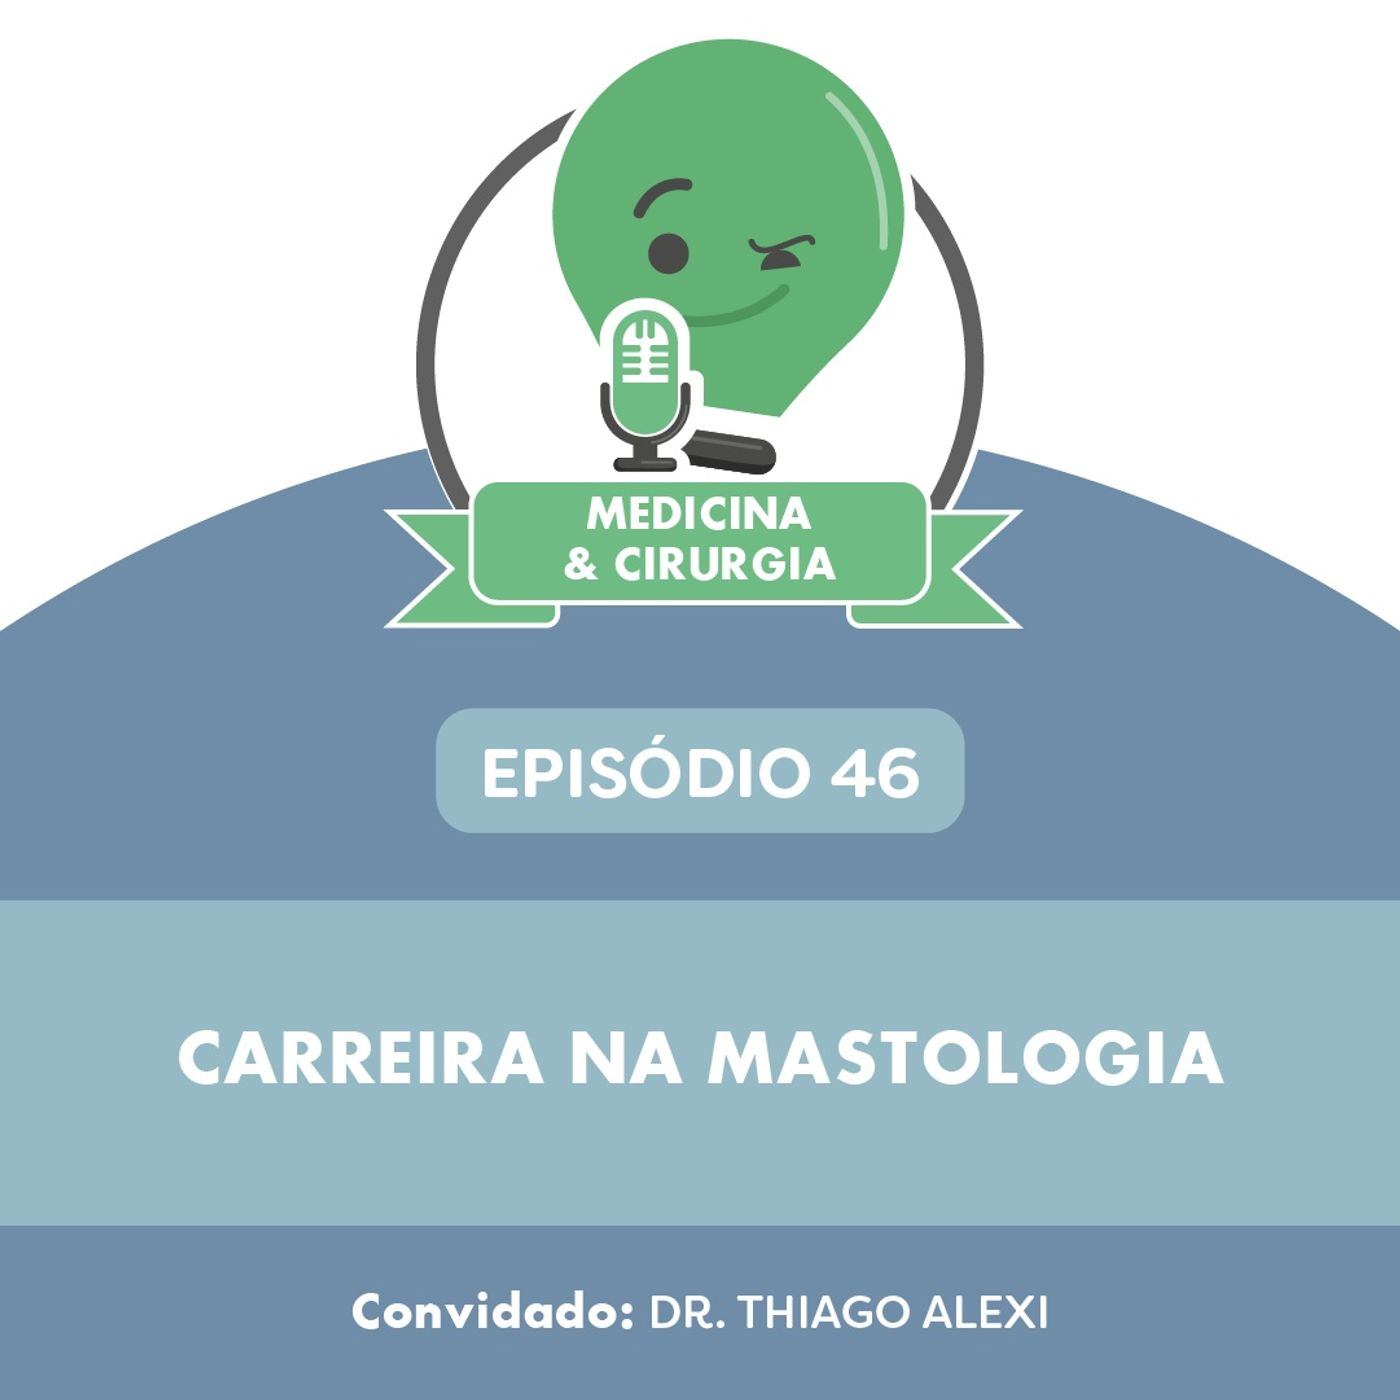 46 - Carreira na mastologia